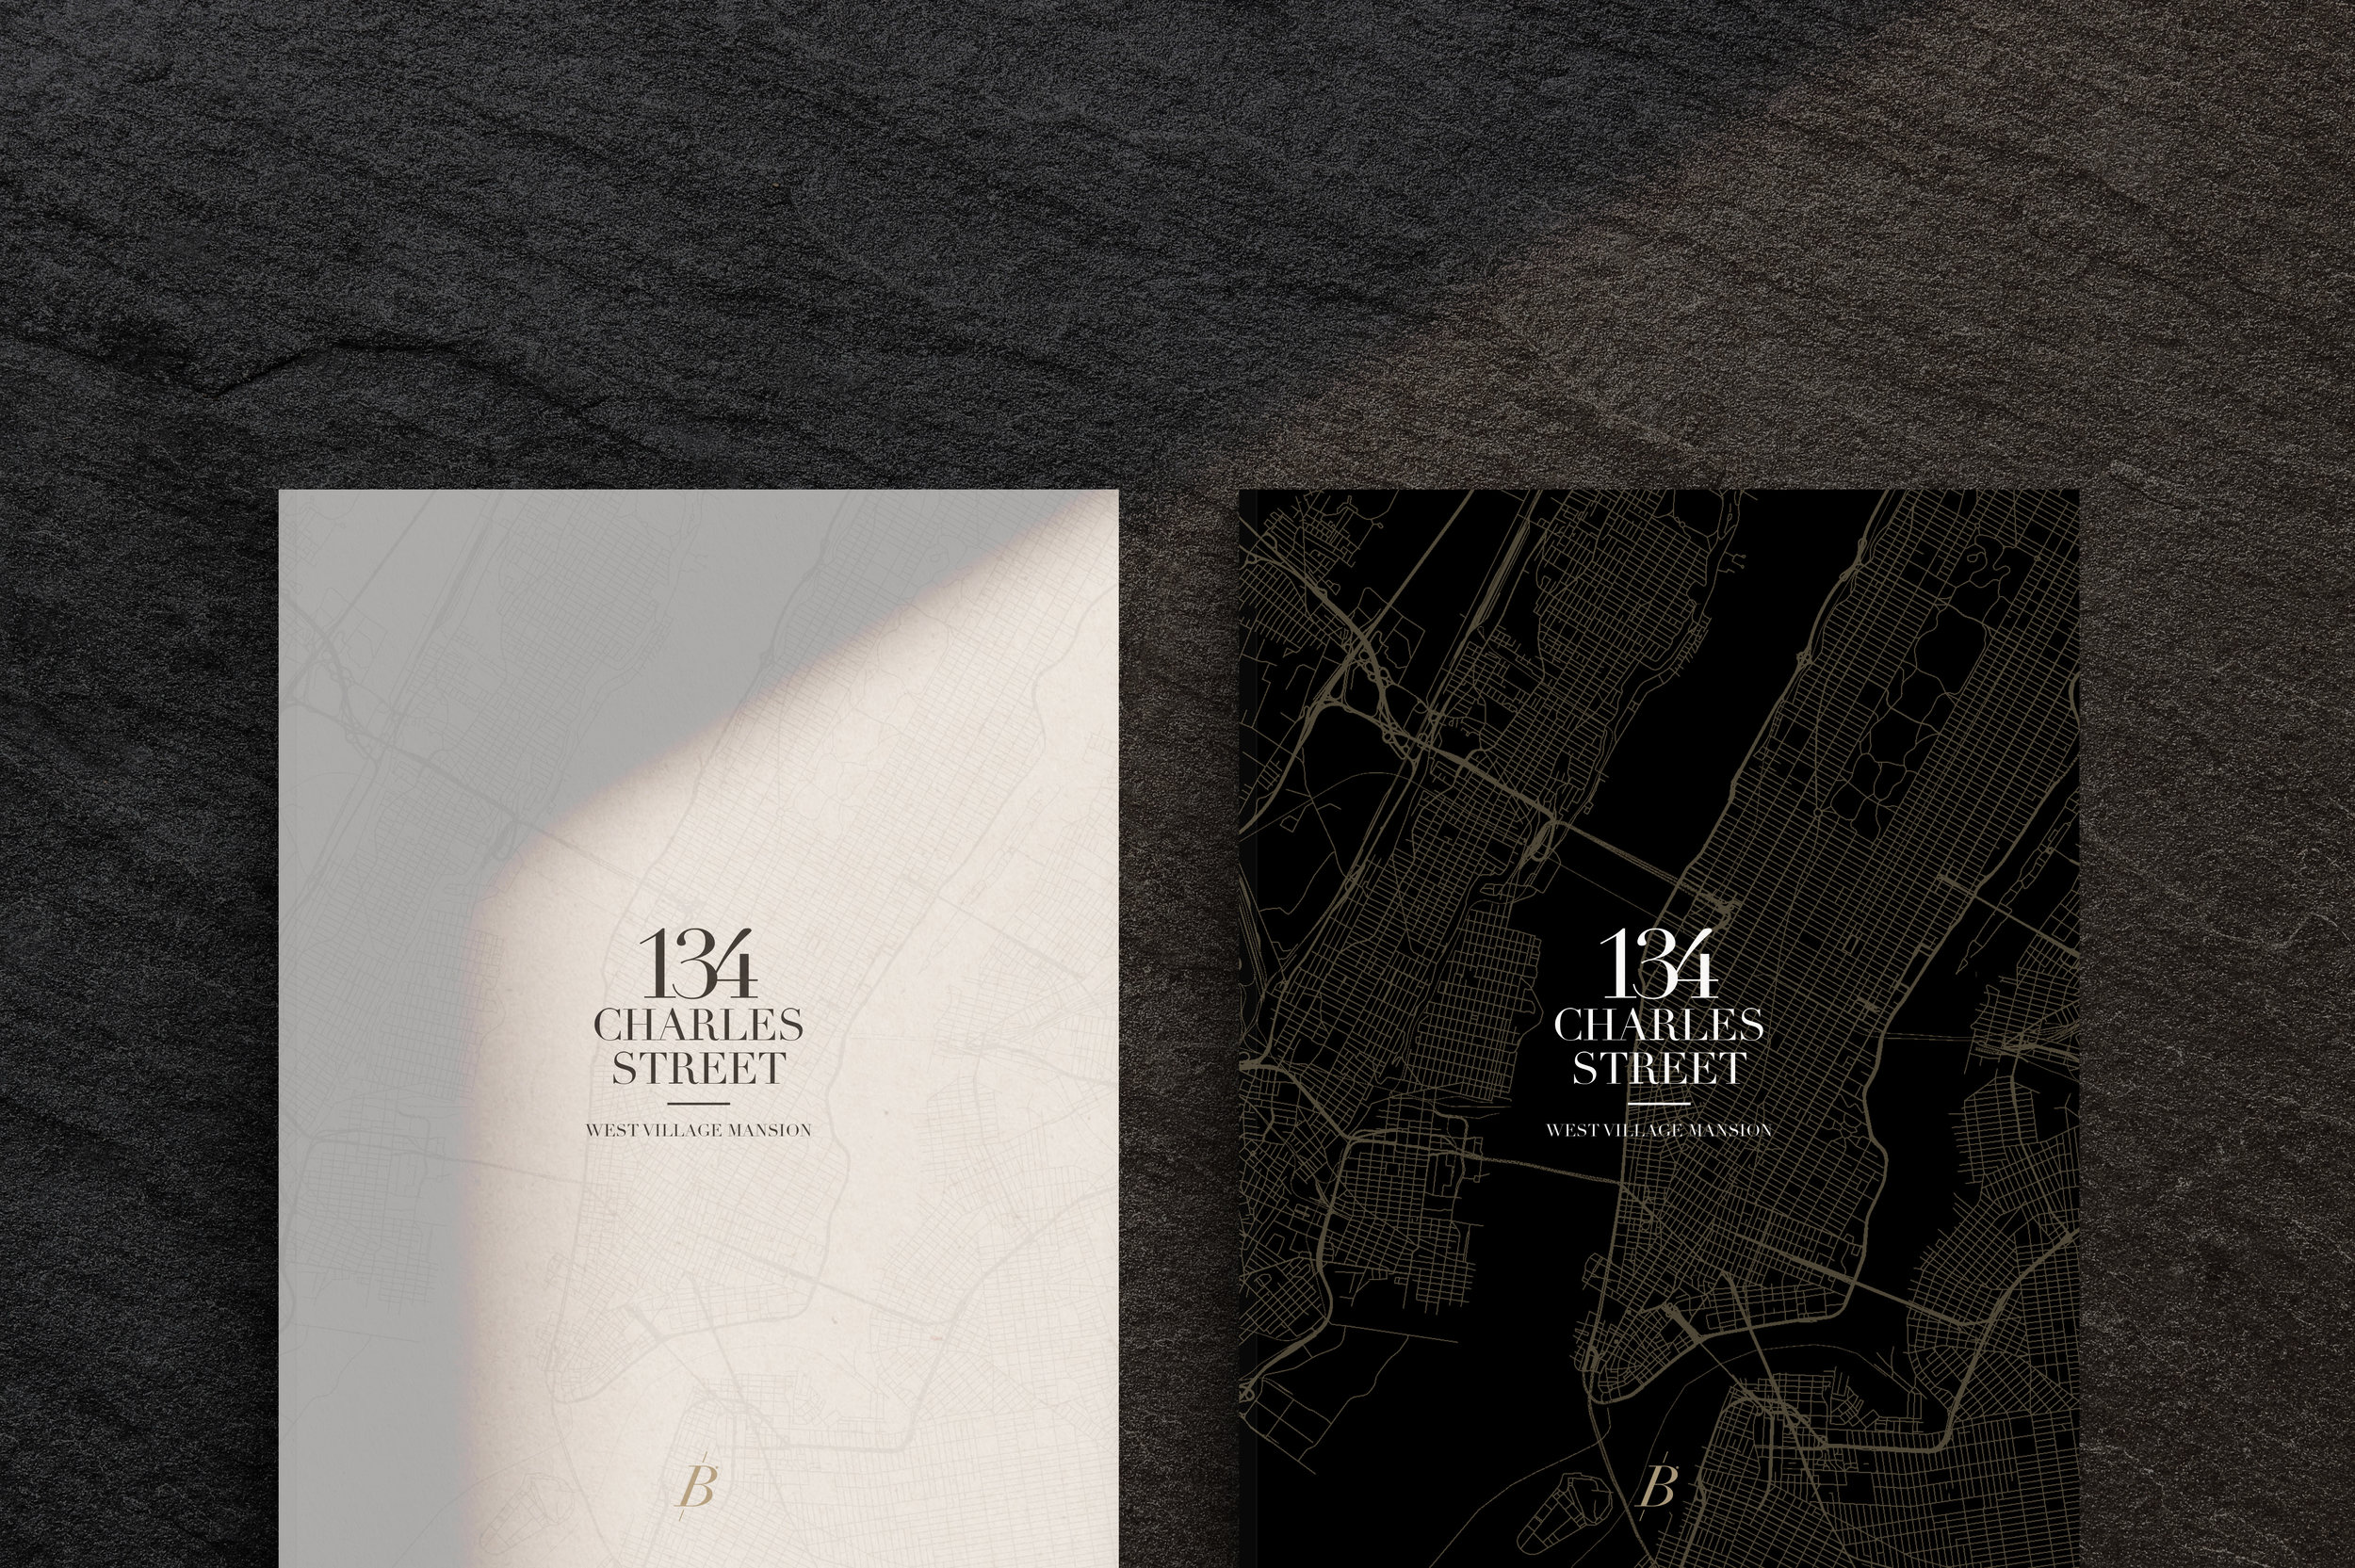 134 Charles_Covers.jpg